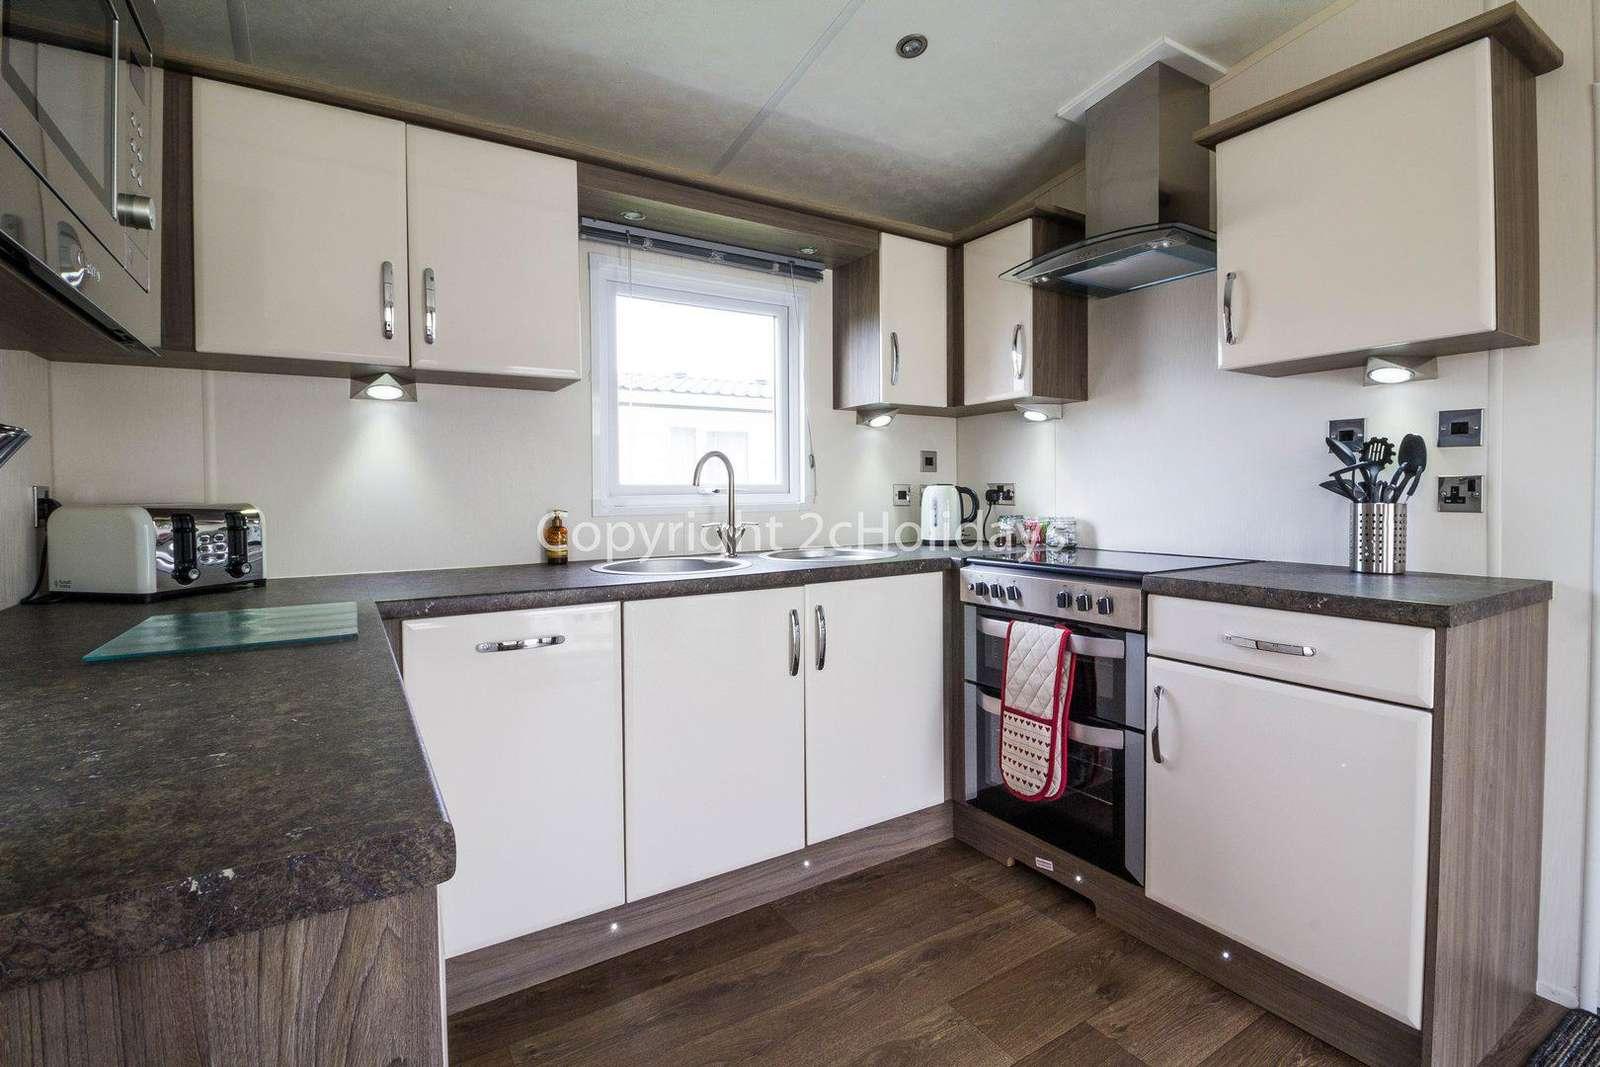 Coastal accommodation in Essex